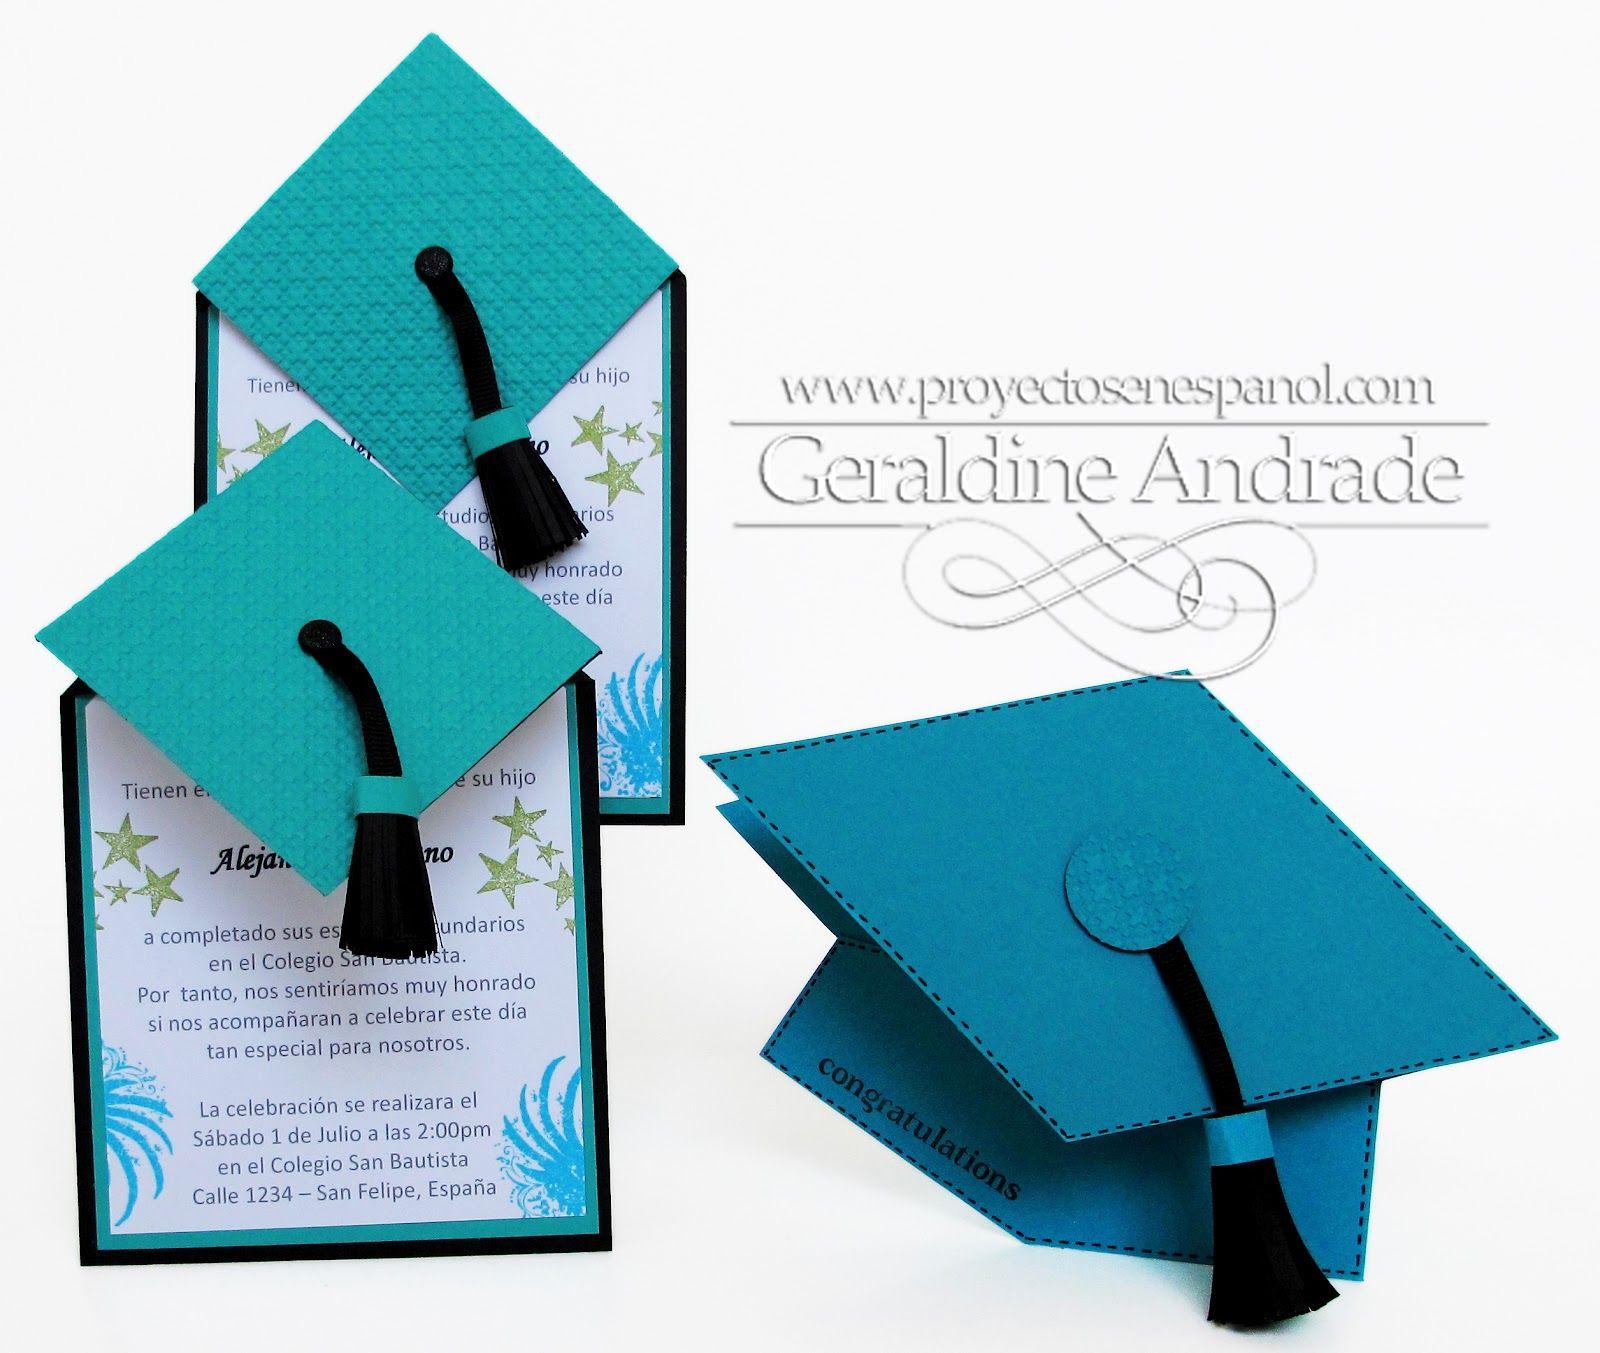 Mafer 39 s creations tarjetas de graduacion graduation for Decoracion grado universidad